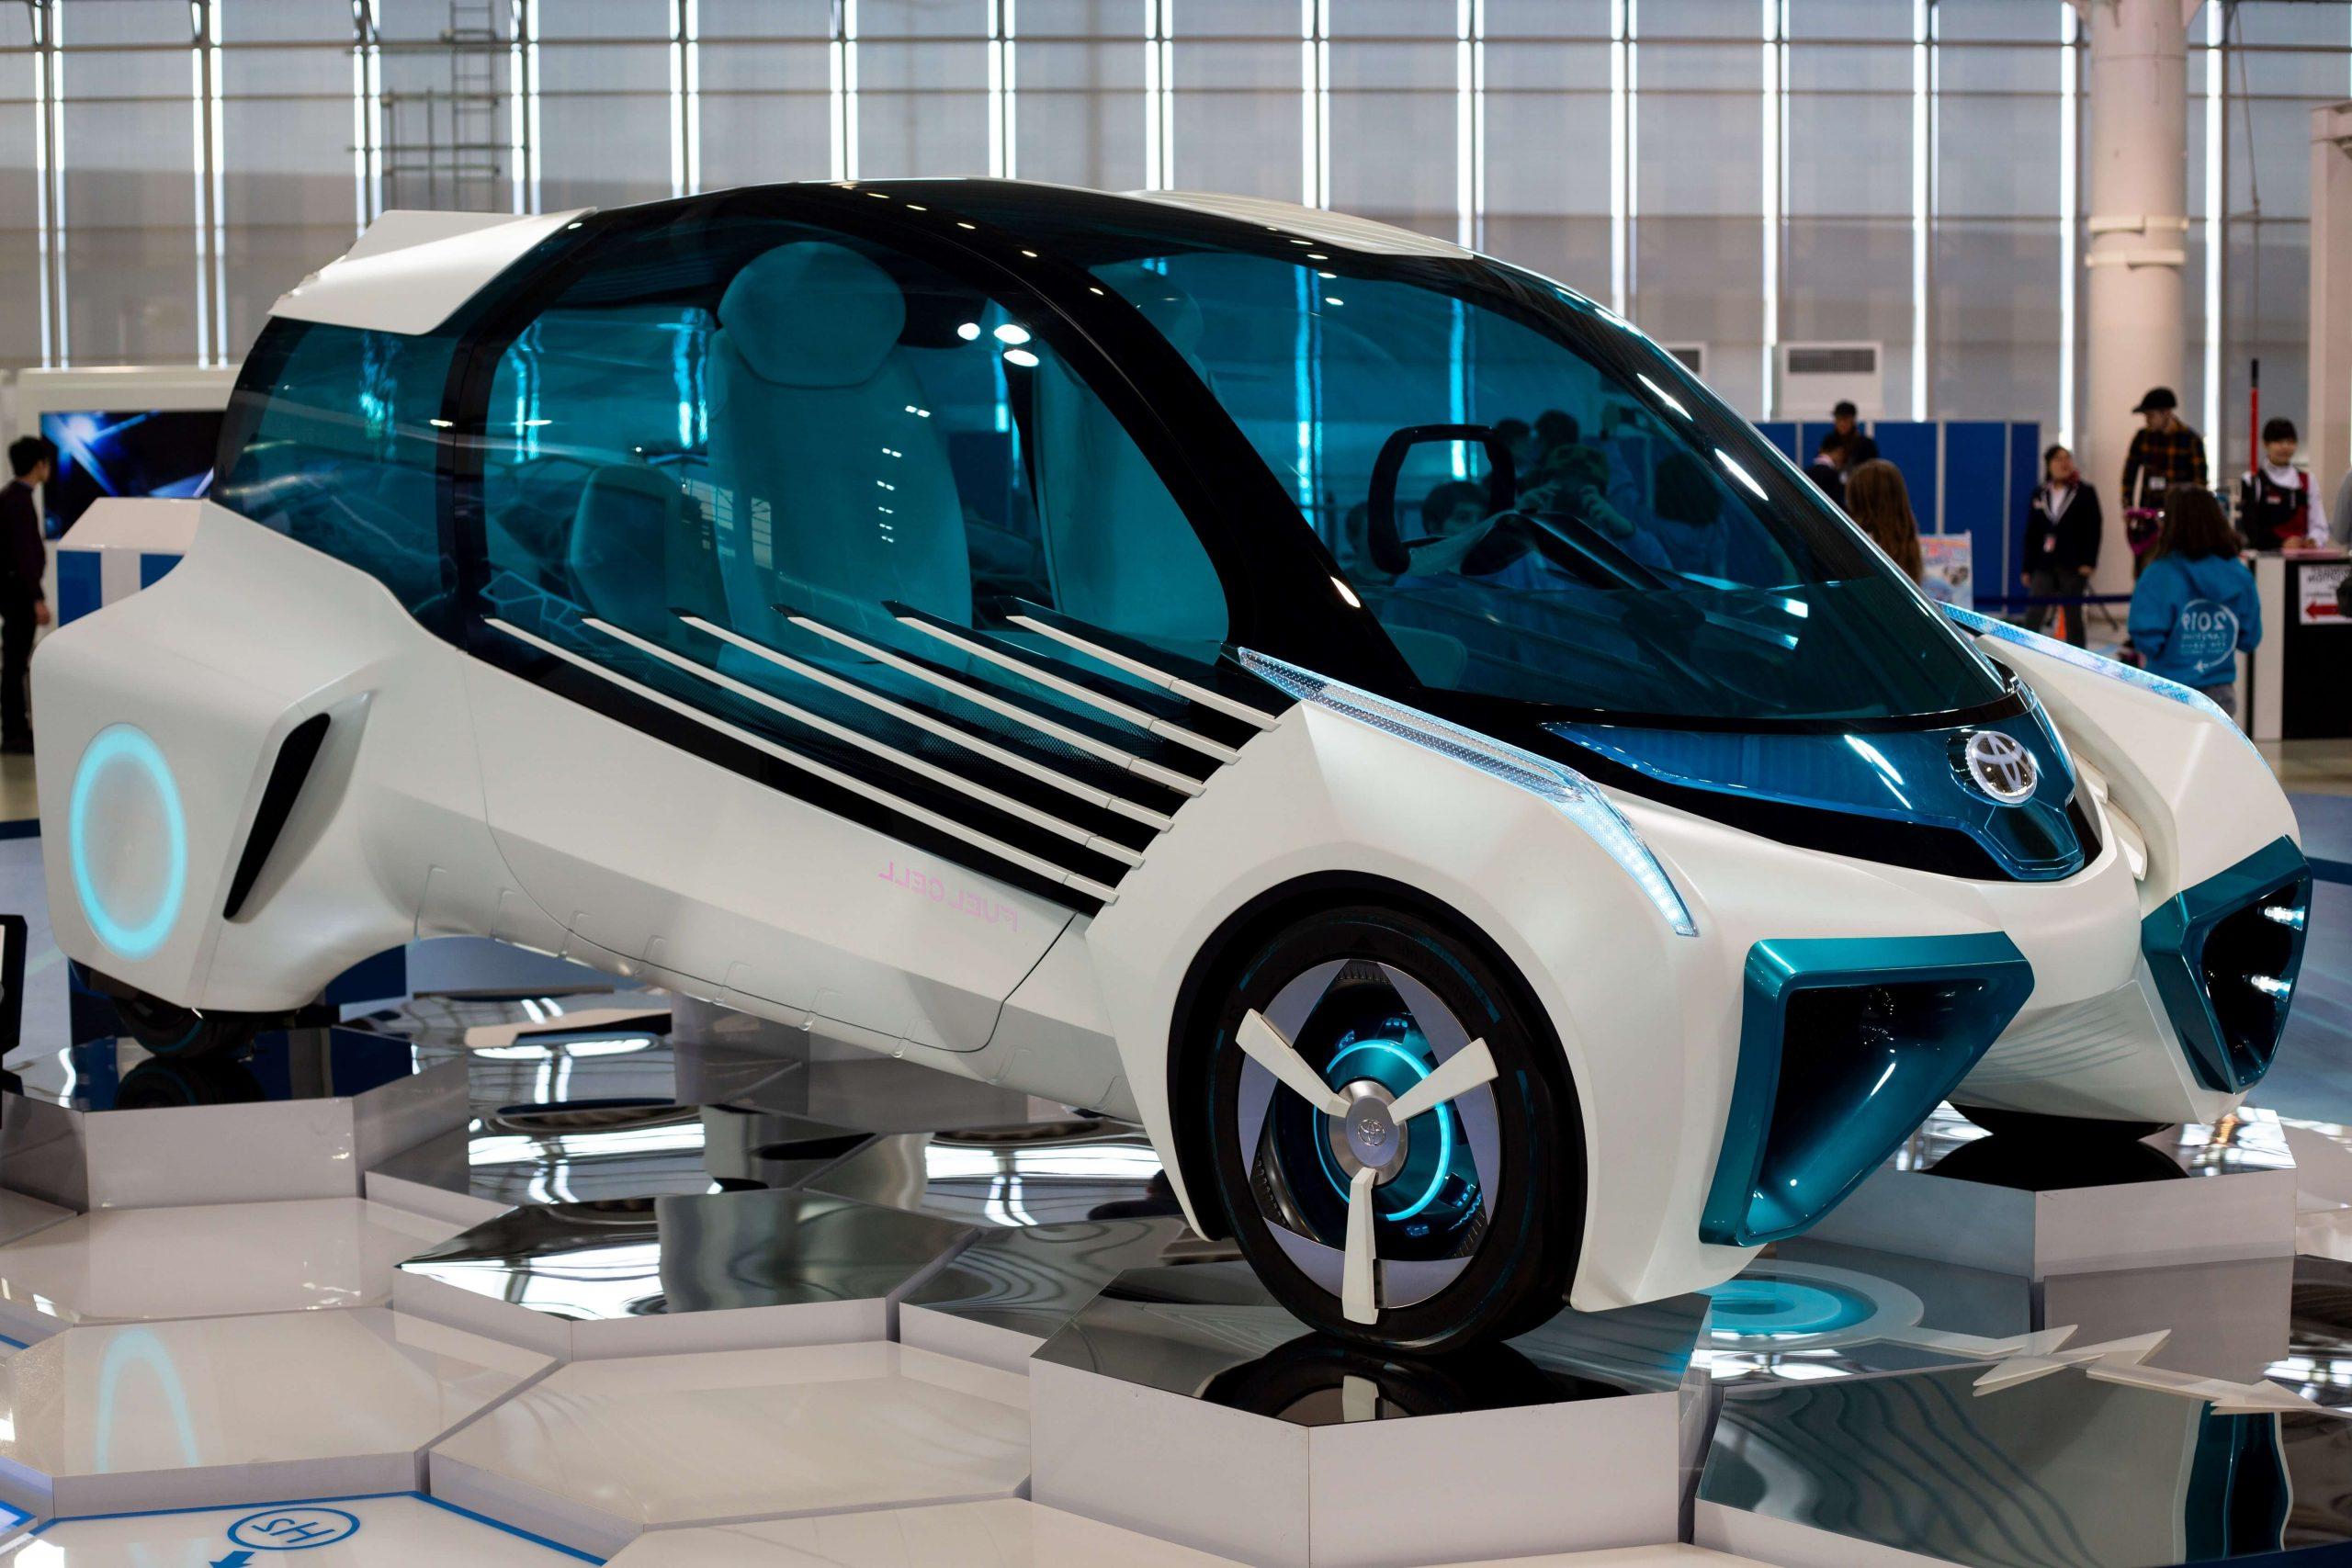 Vernetztes Fahren – Das digitale Auto als Sicherheitsrisiko?